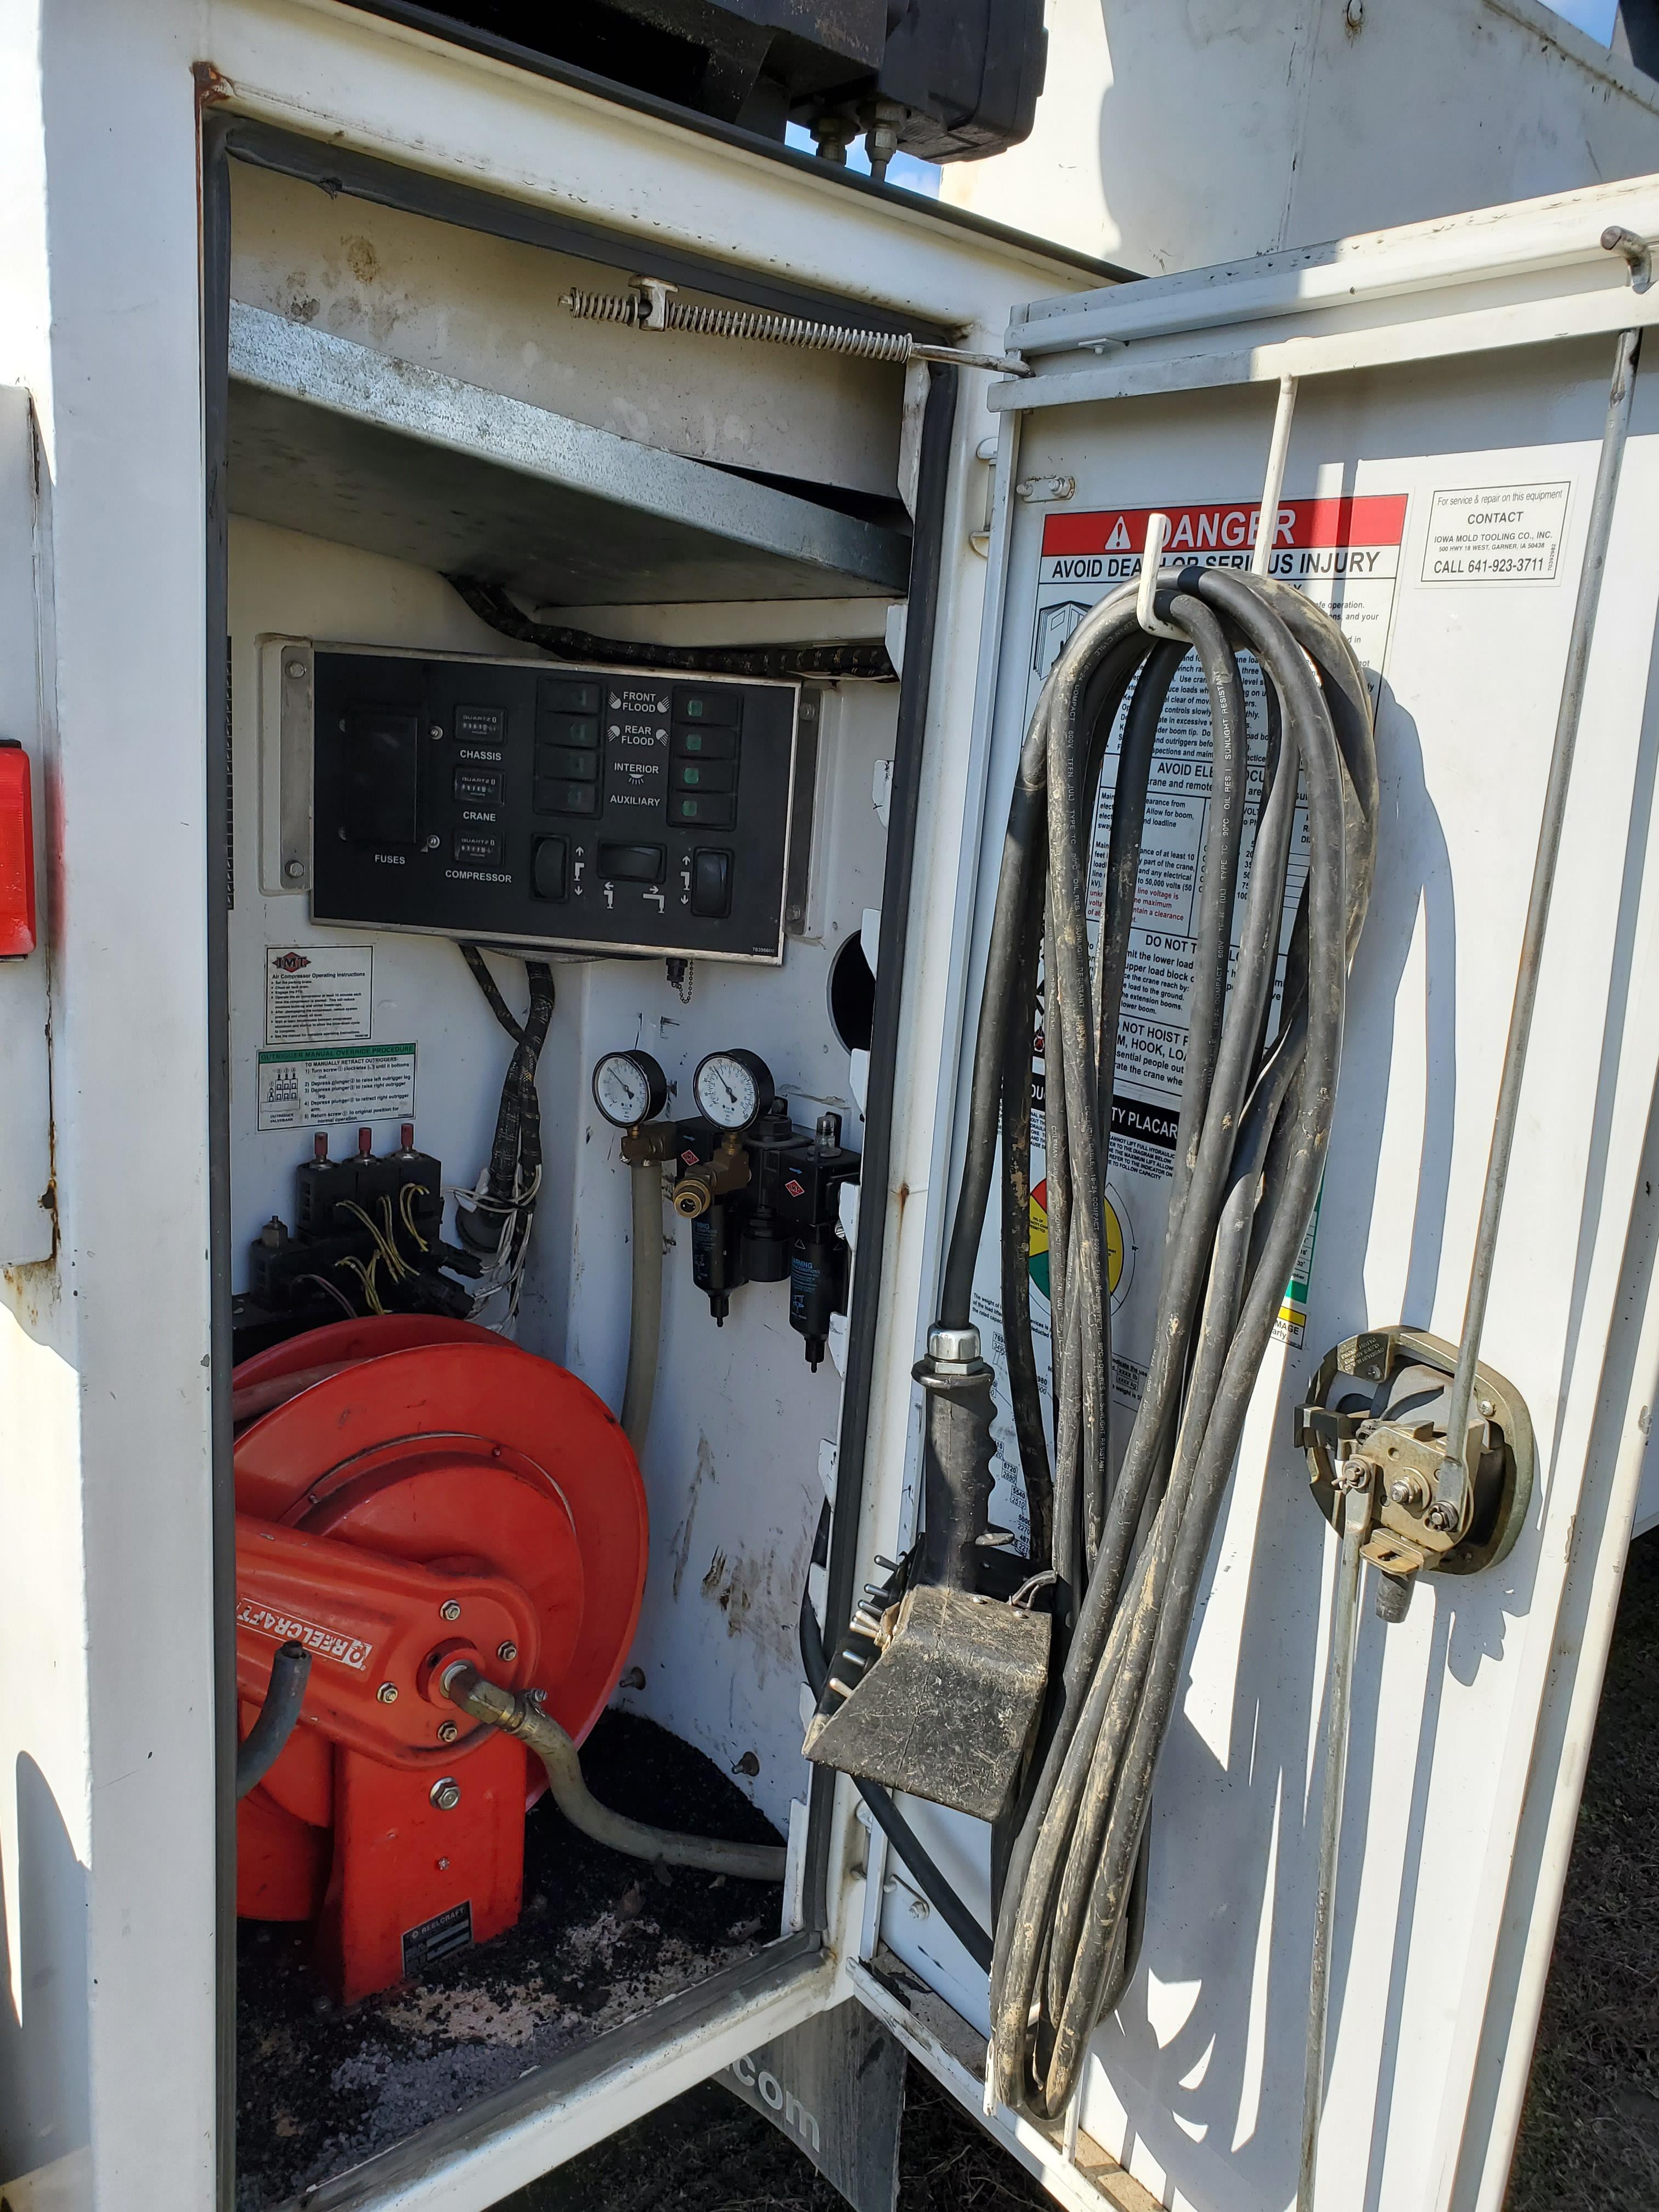 2007 Ford F750 Mechanic's Crane Truck, Cat C7 ACERT Diesel, Auto, 13 ft. IMF Dominator Body - Image 13 of 33